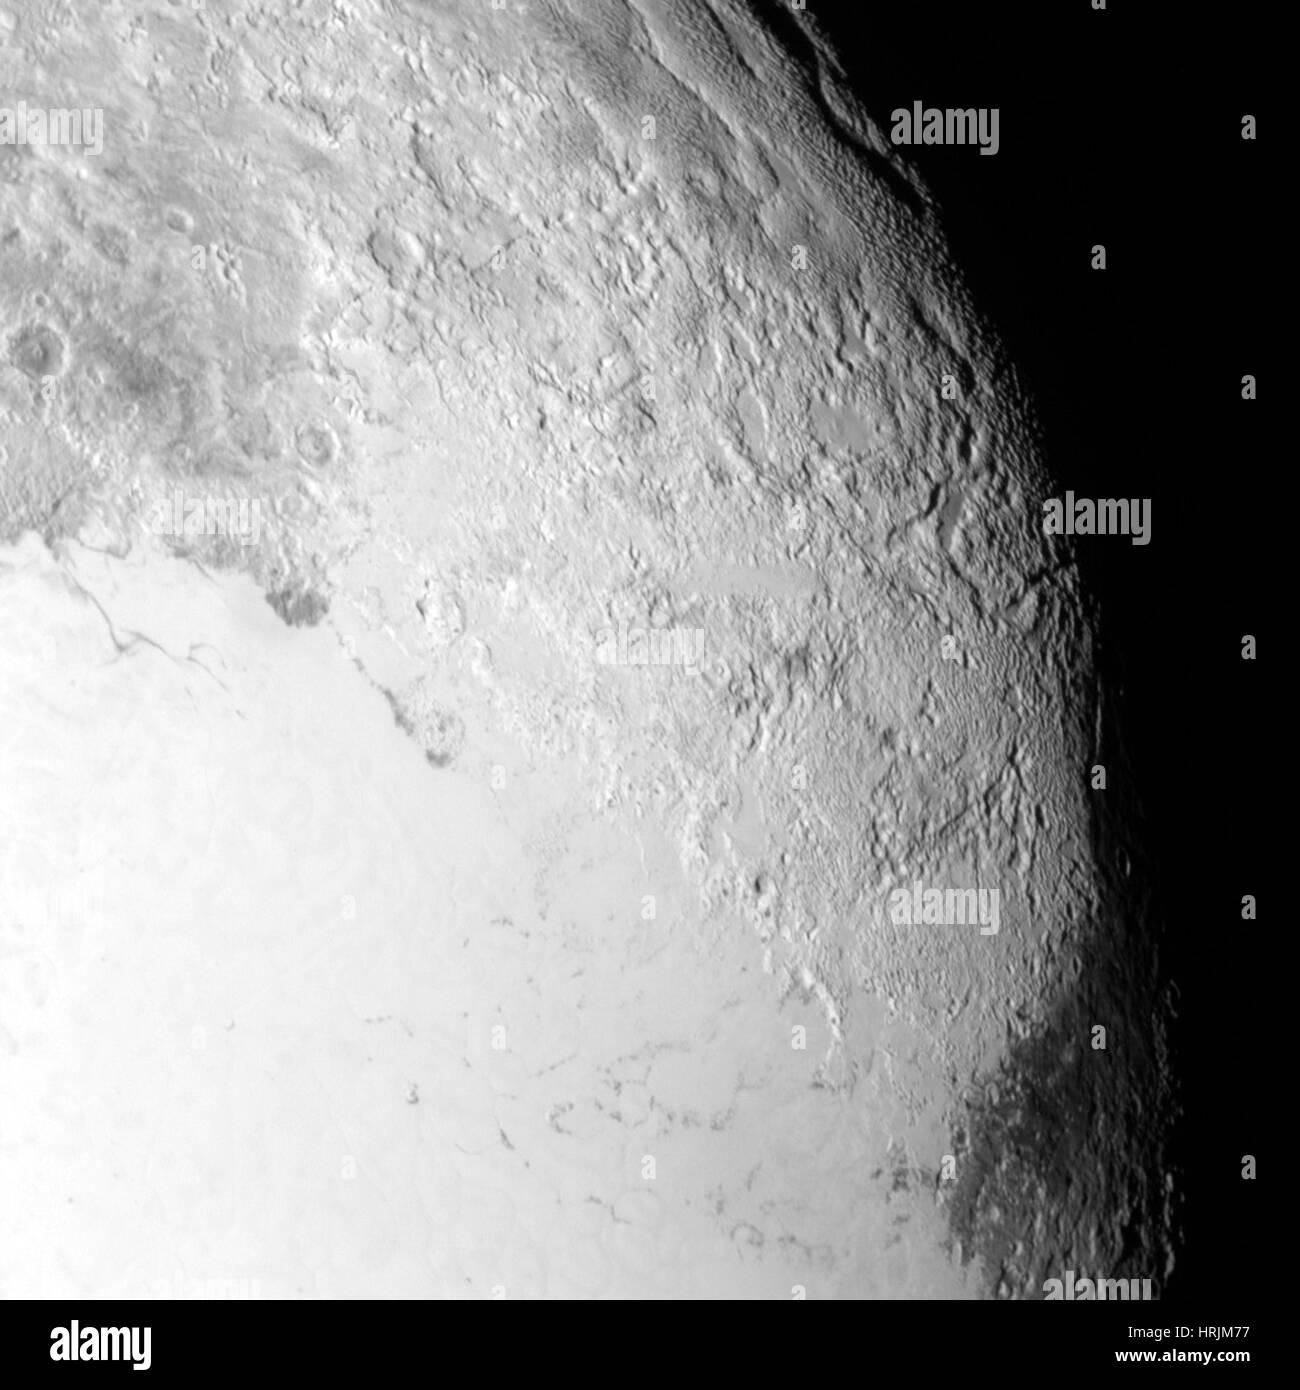 Pluto, LORRI image, 2015 - Stock Image